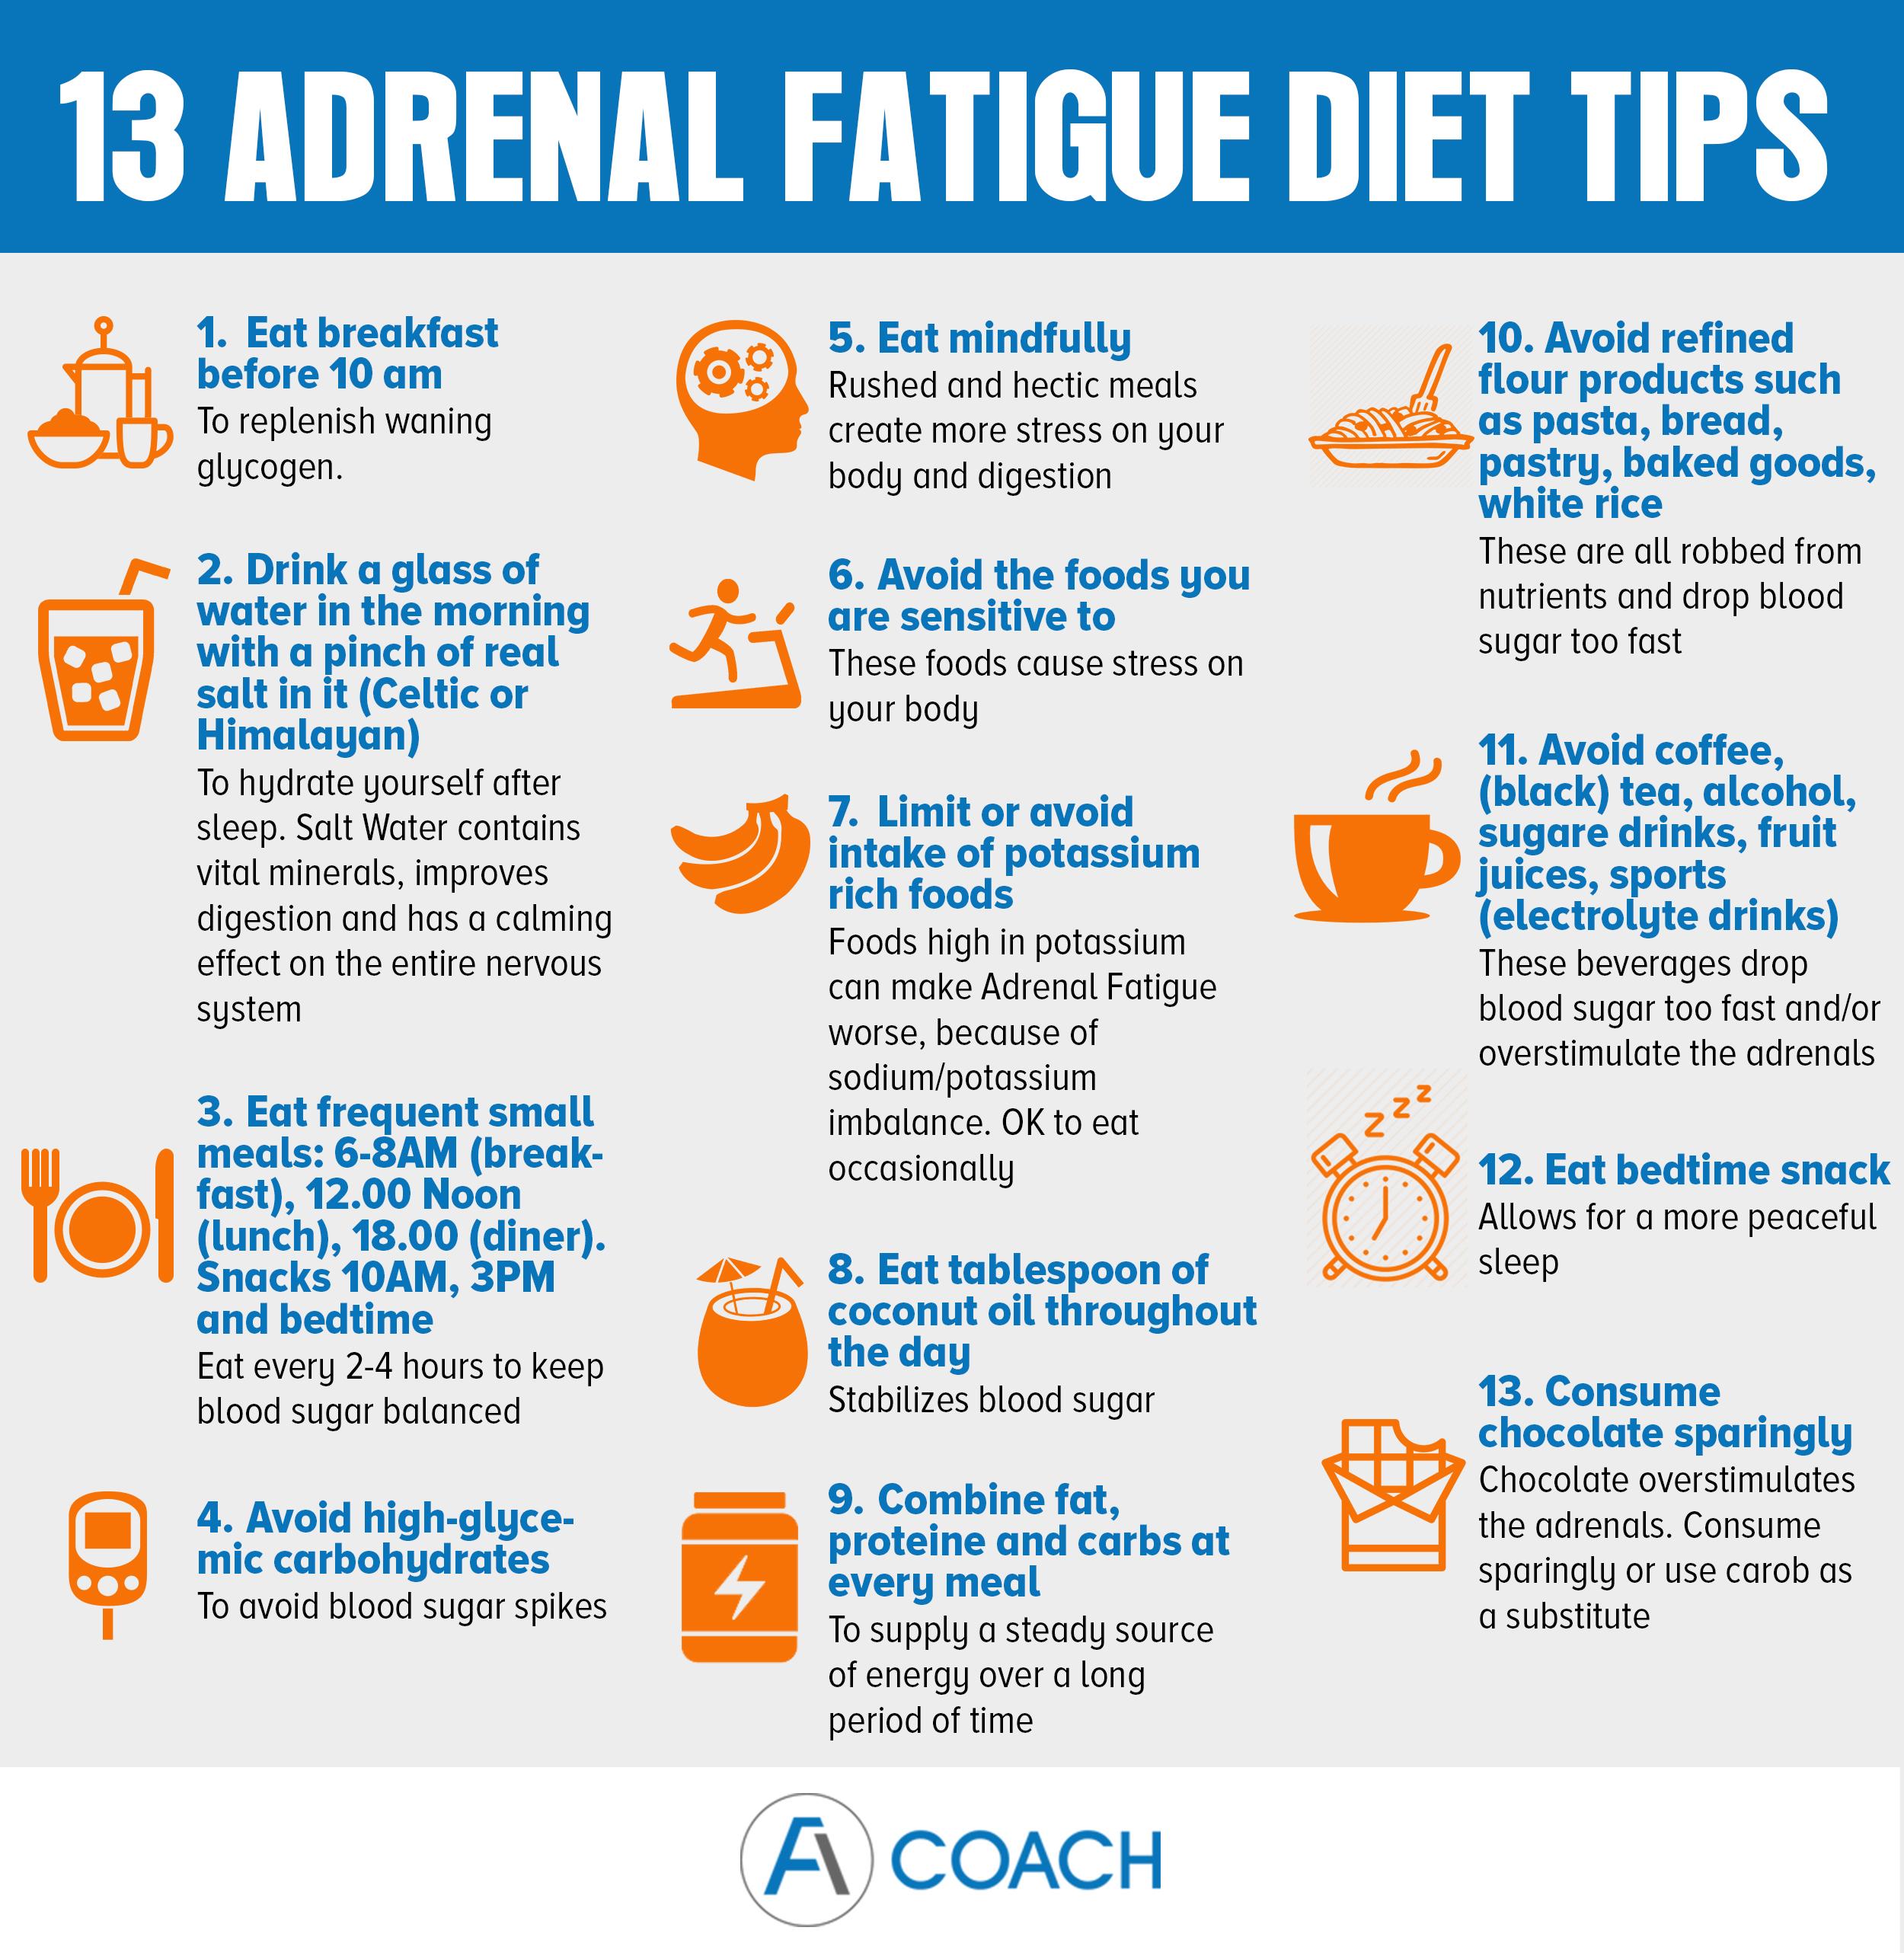 adrenal fatigue diet tips